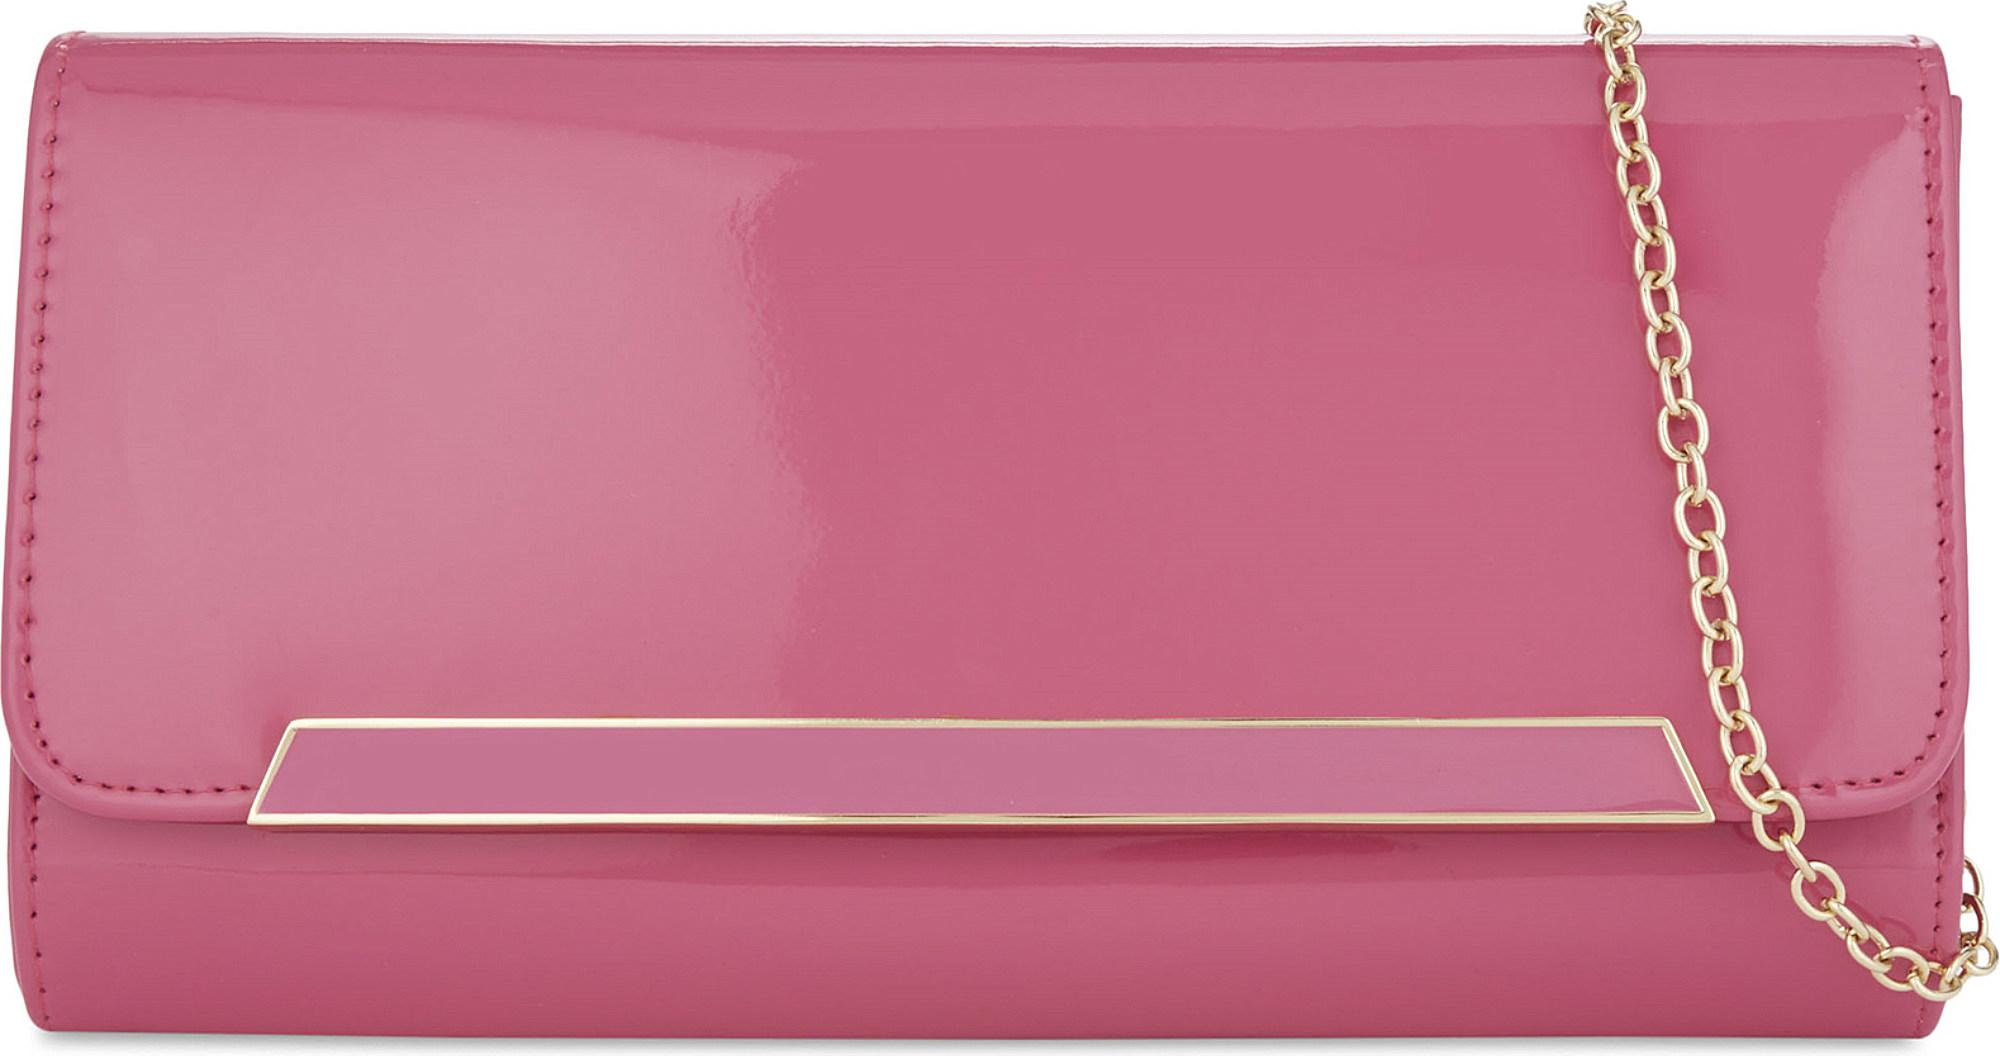 be8158bf4ec Lyst - ALDO Jeriecien Patent Clutch in Pink